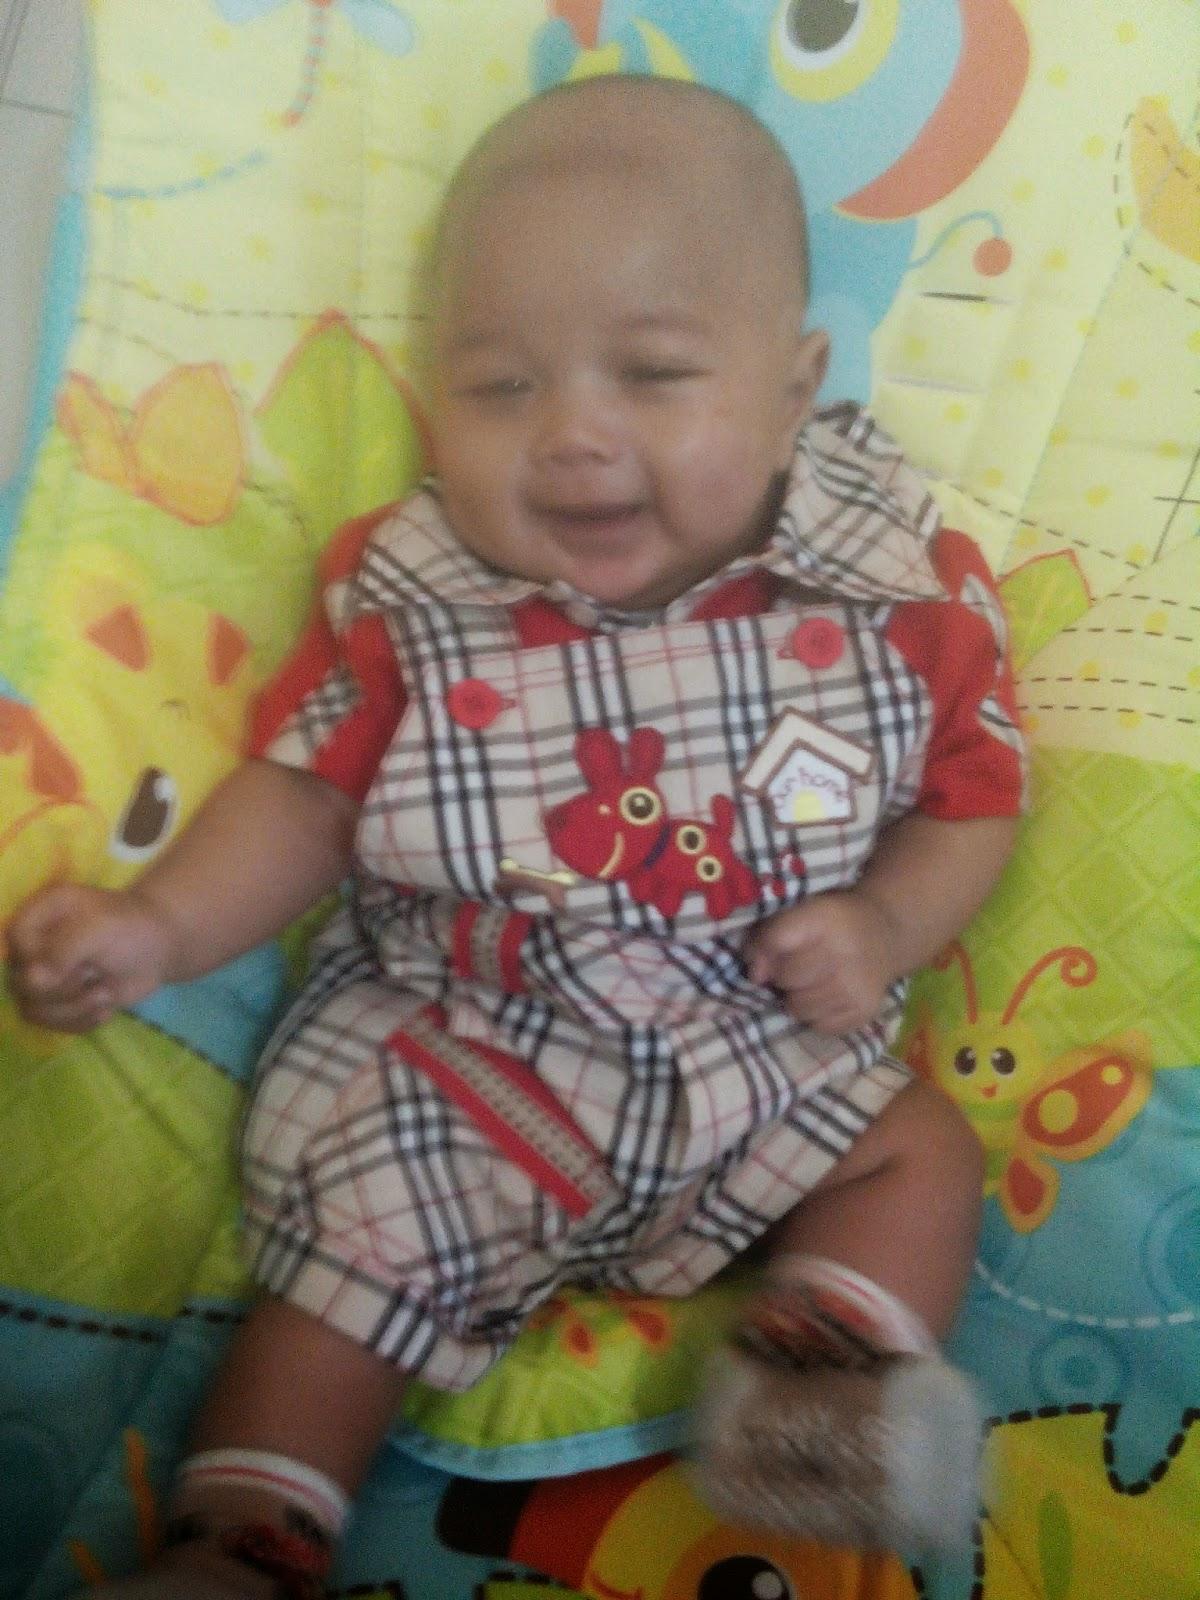 Manfaat ASI Pada Bayi